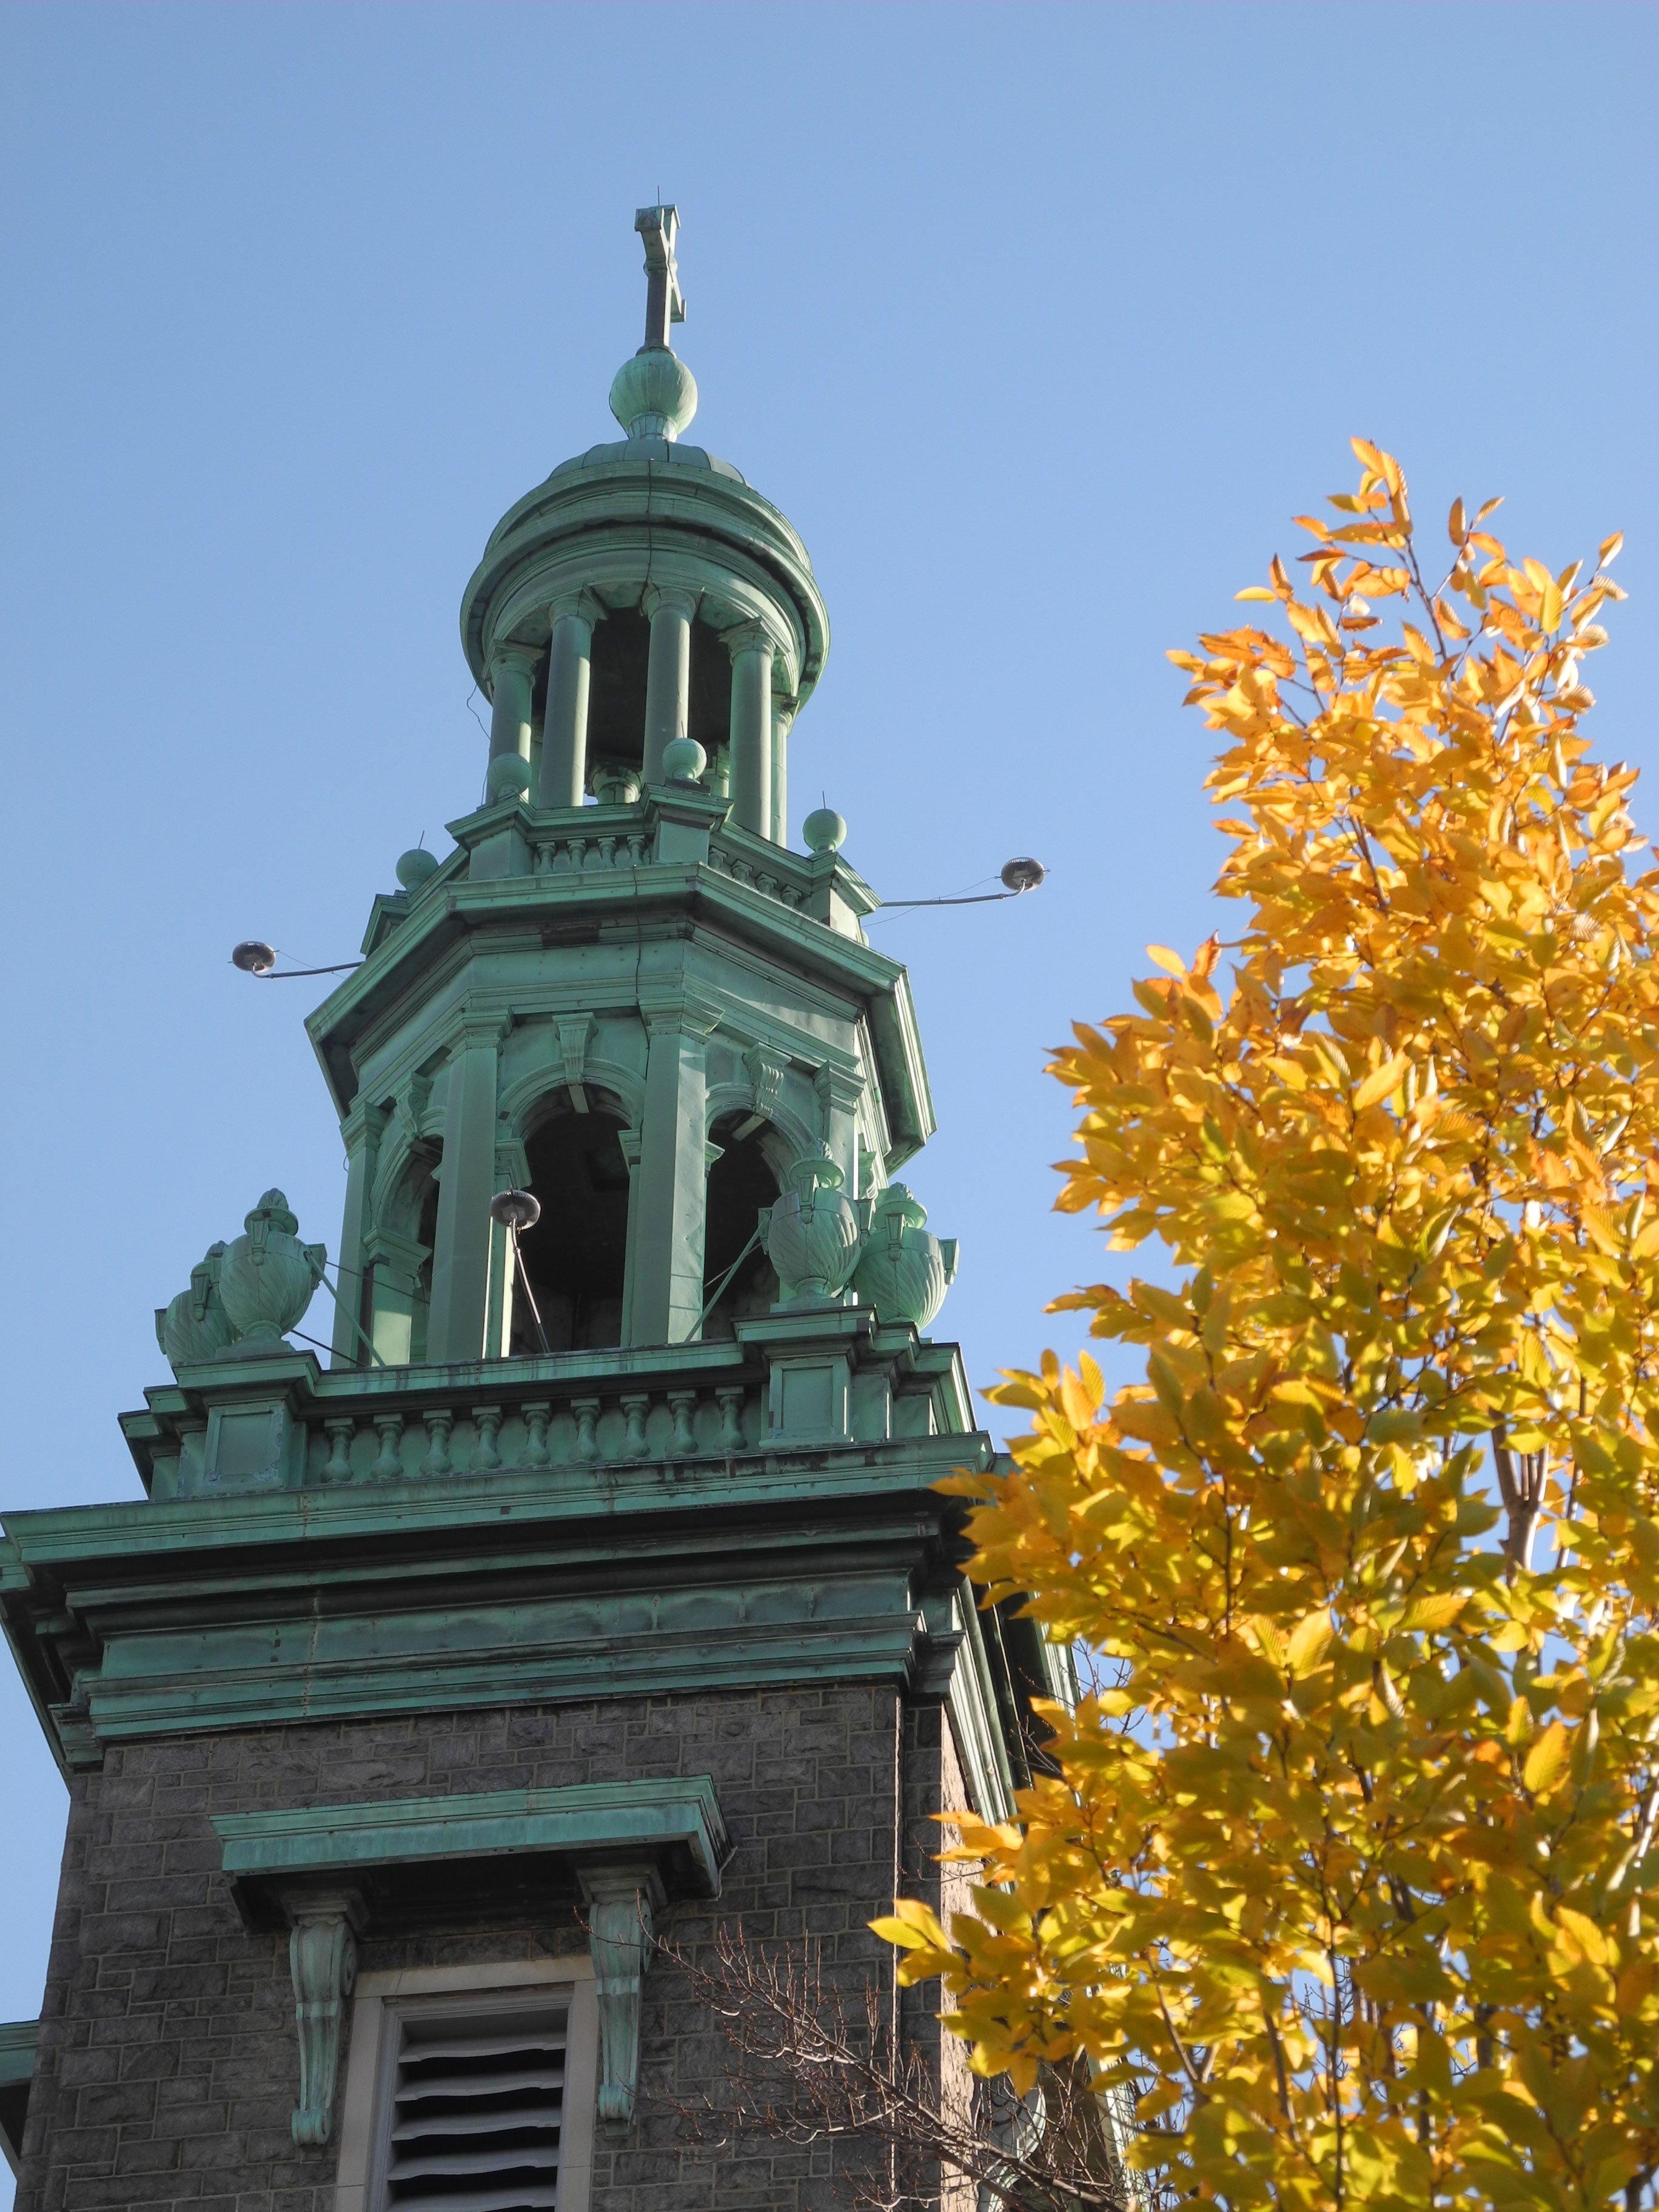 Tower of St Joseph's Church